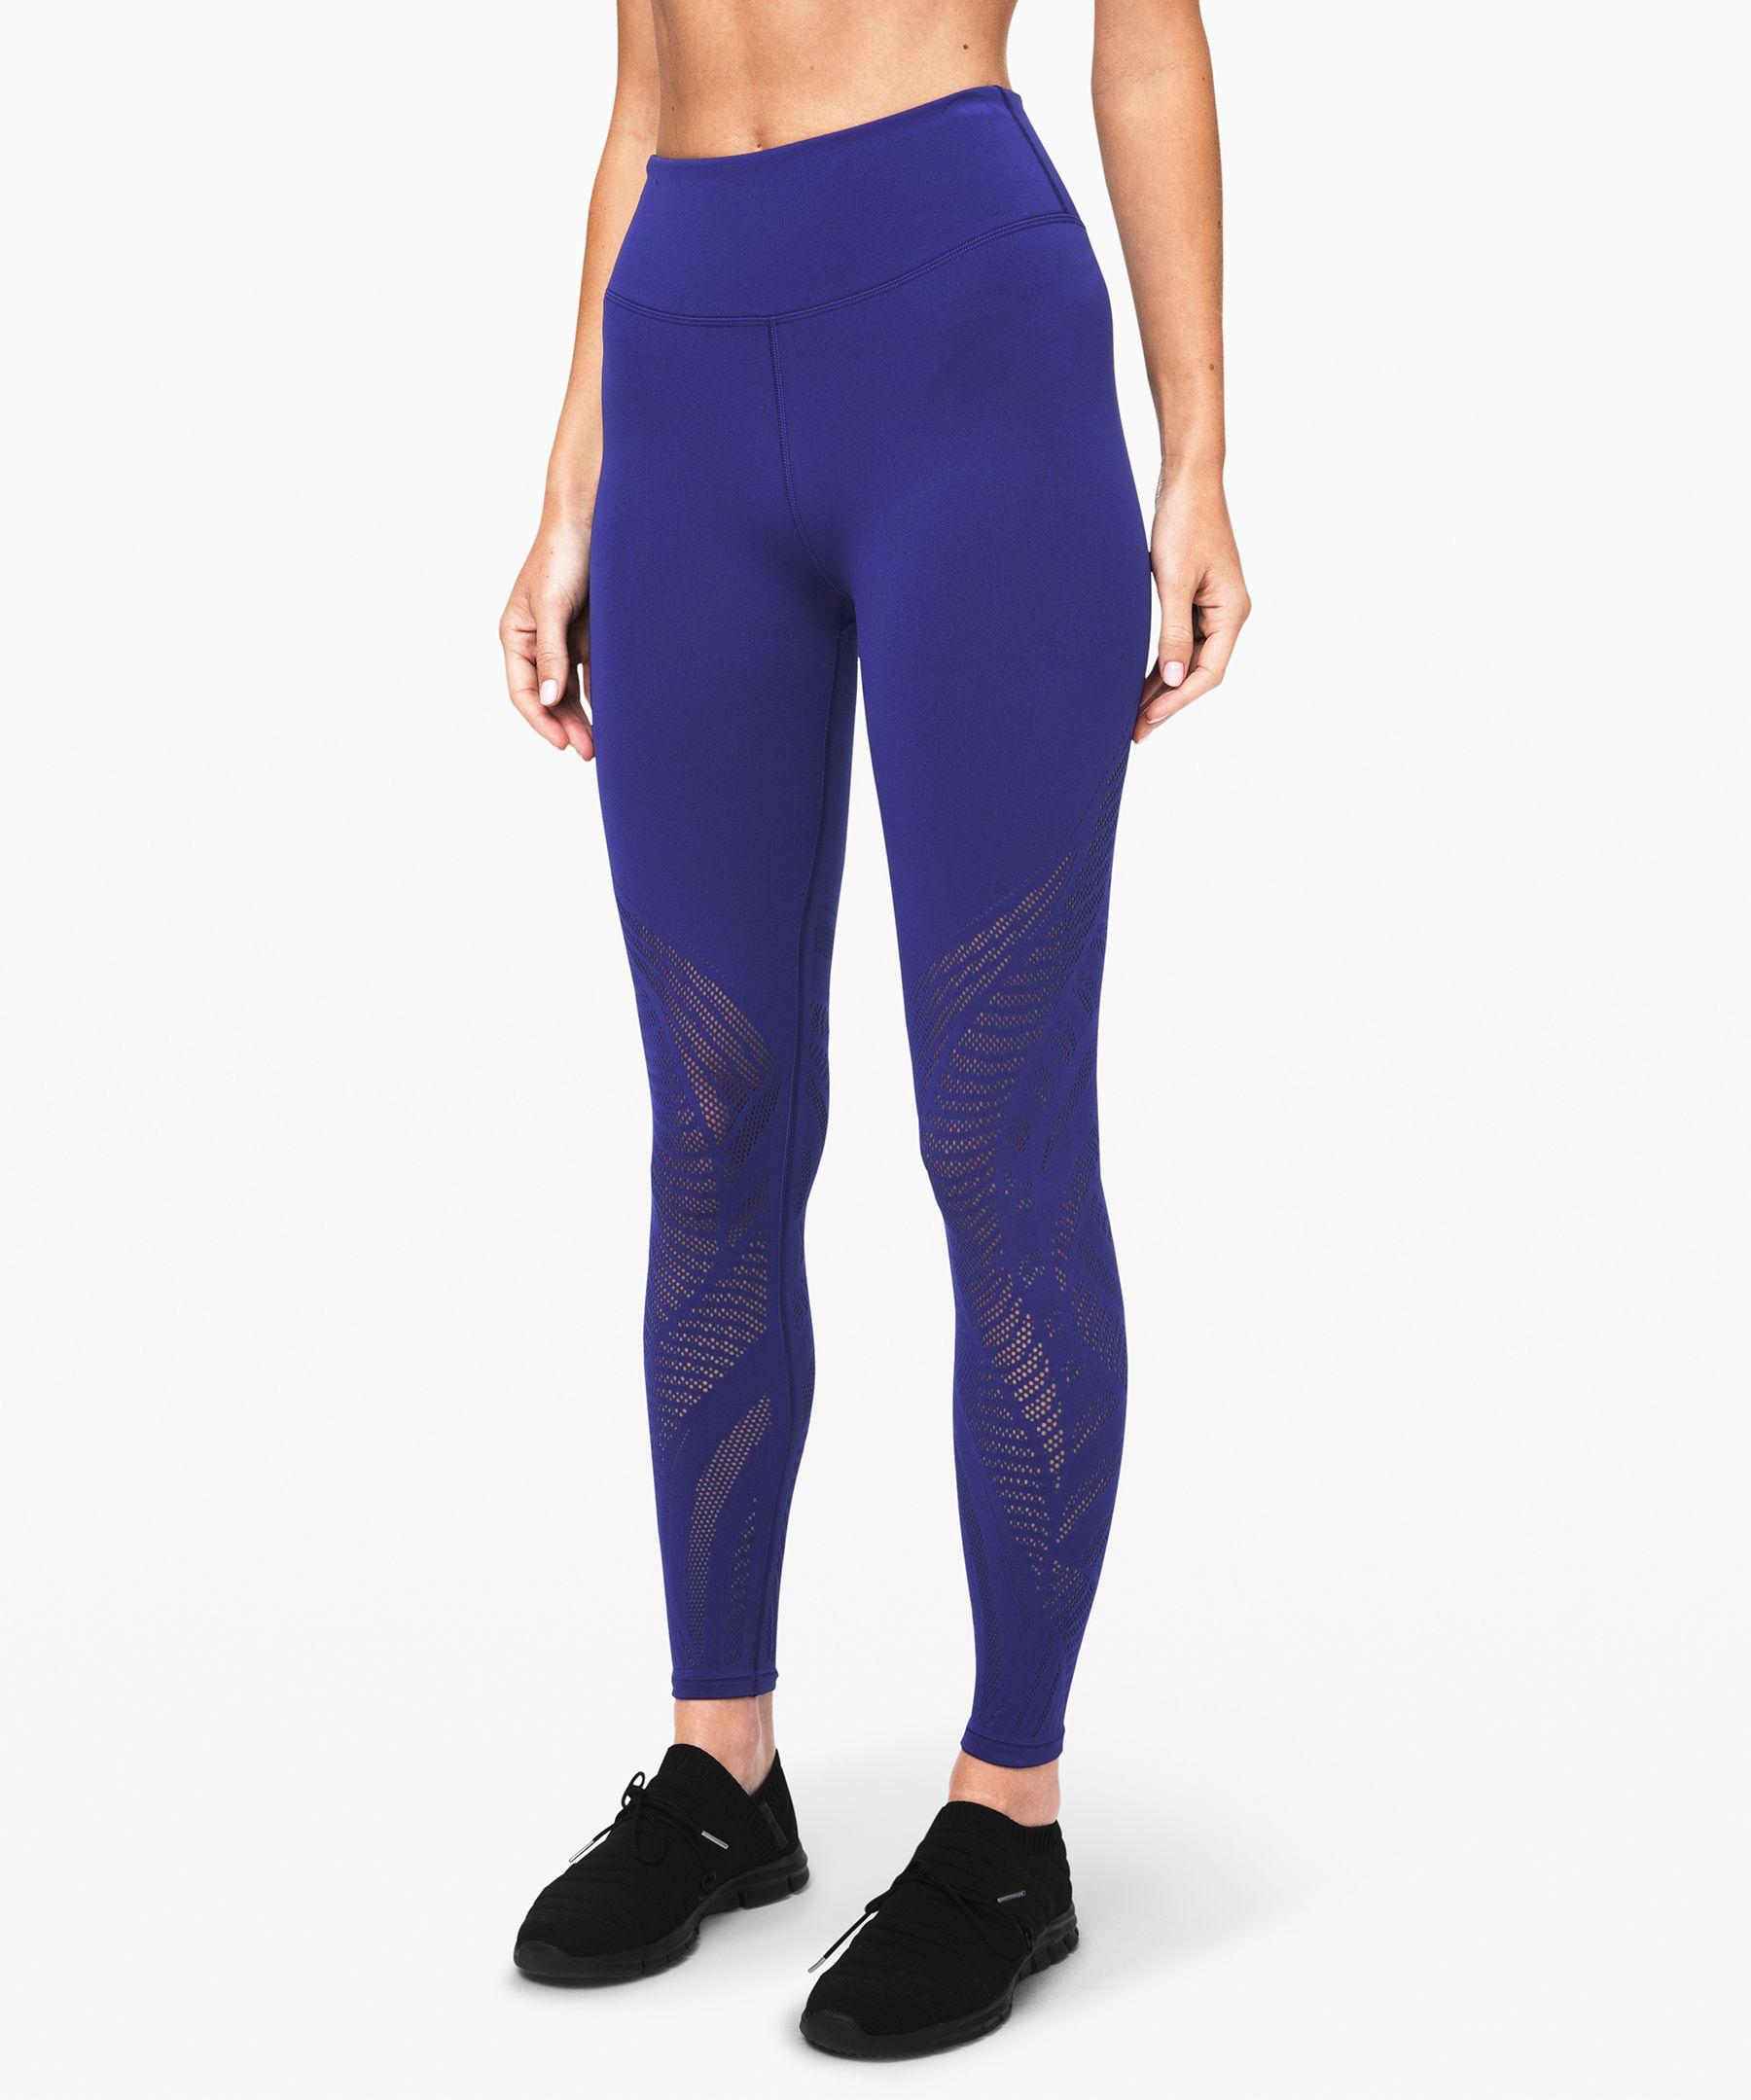 "Reveal Tight 26 *Aurora},styles:[{fabric-id:[LW5BU8S_fabric],product-feature-id:[LW5BU8S_features],style-colors:[{model-description:Deja is 5'11"" and wears a size 4"